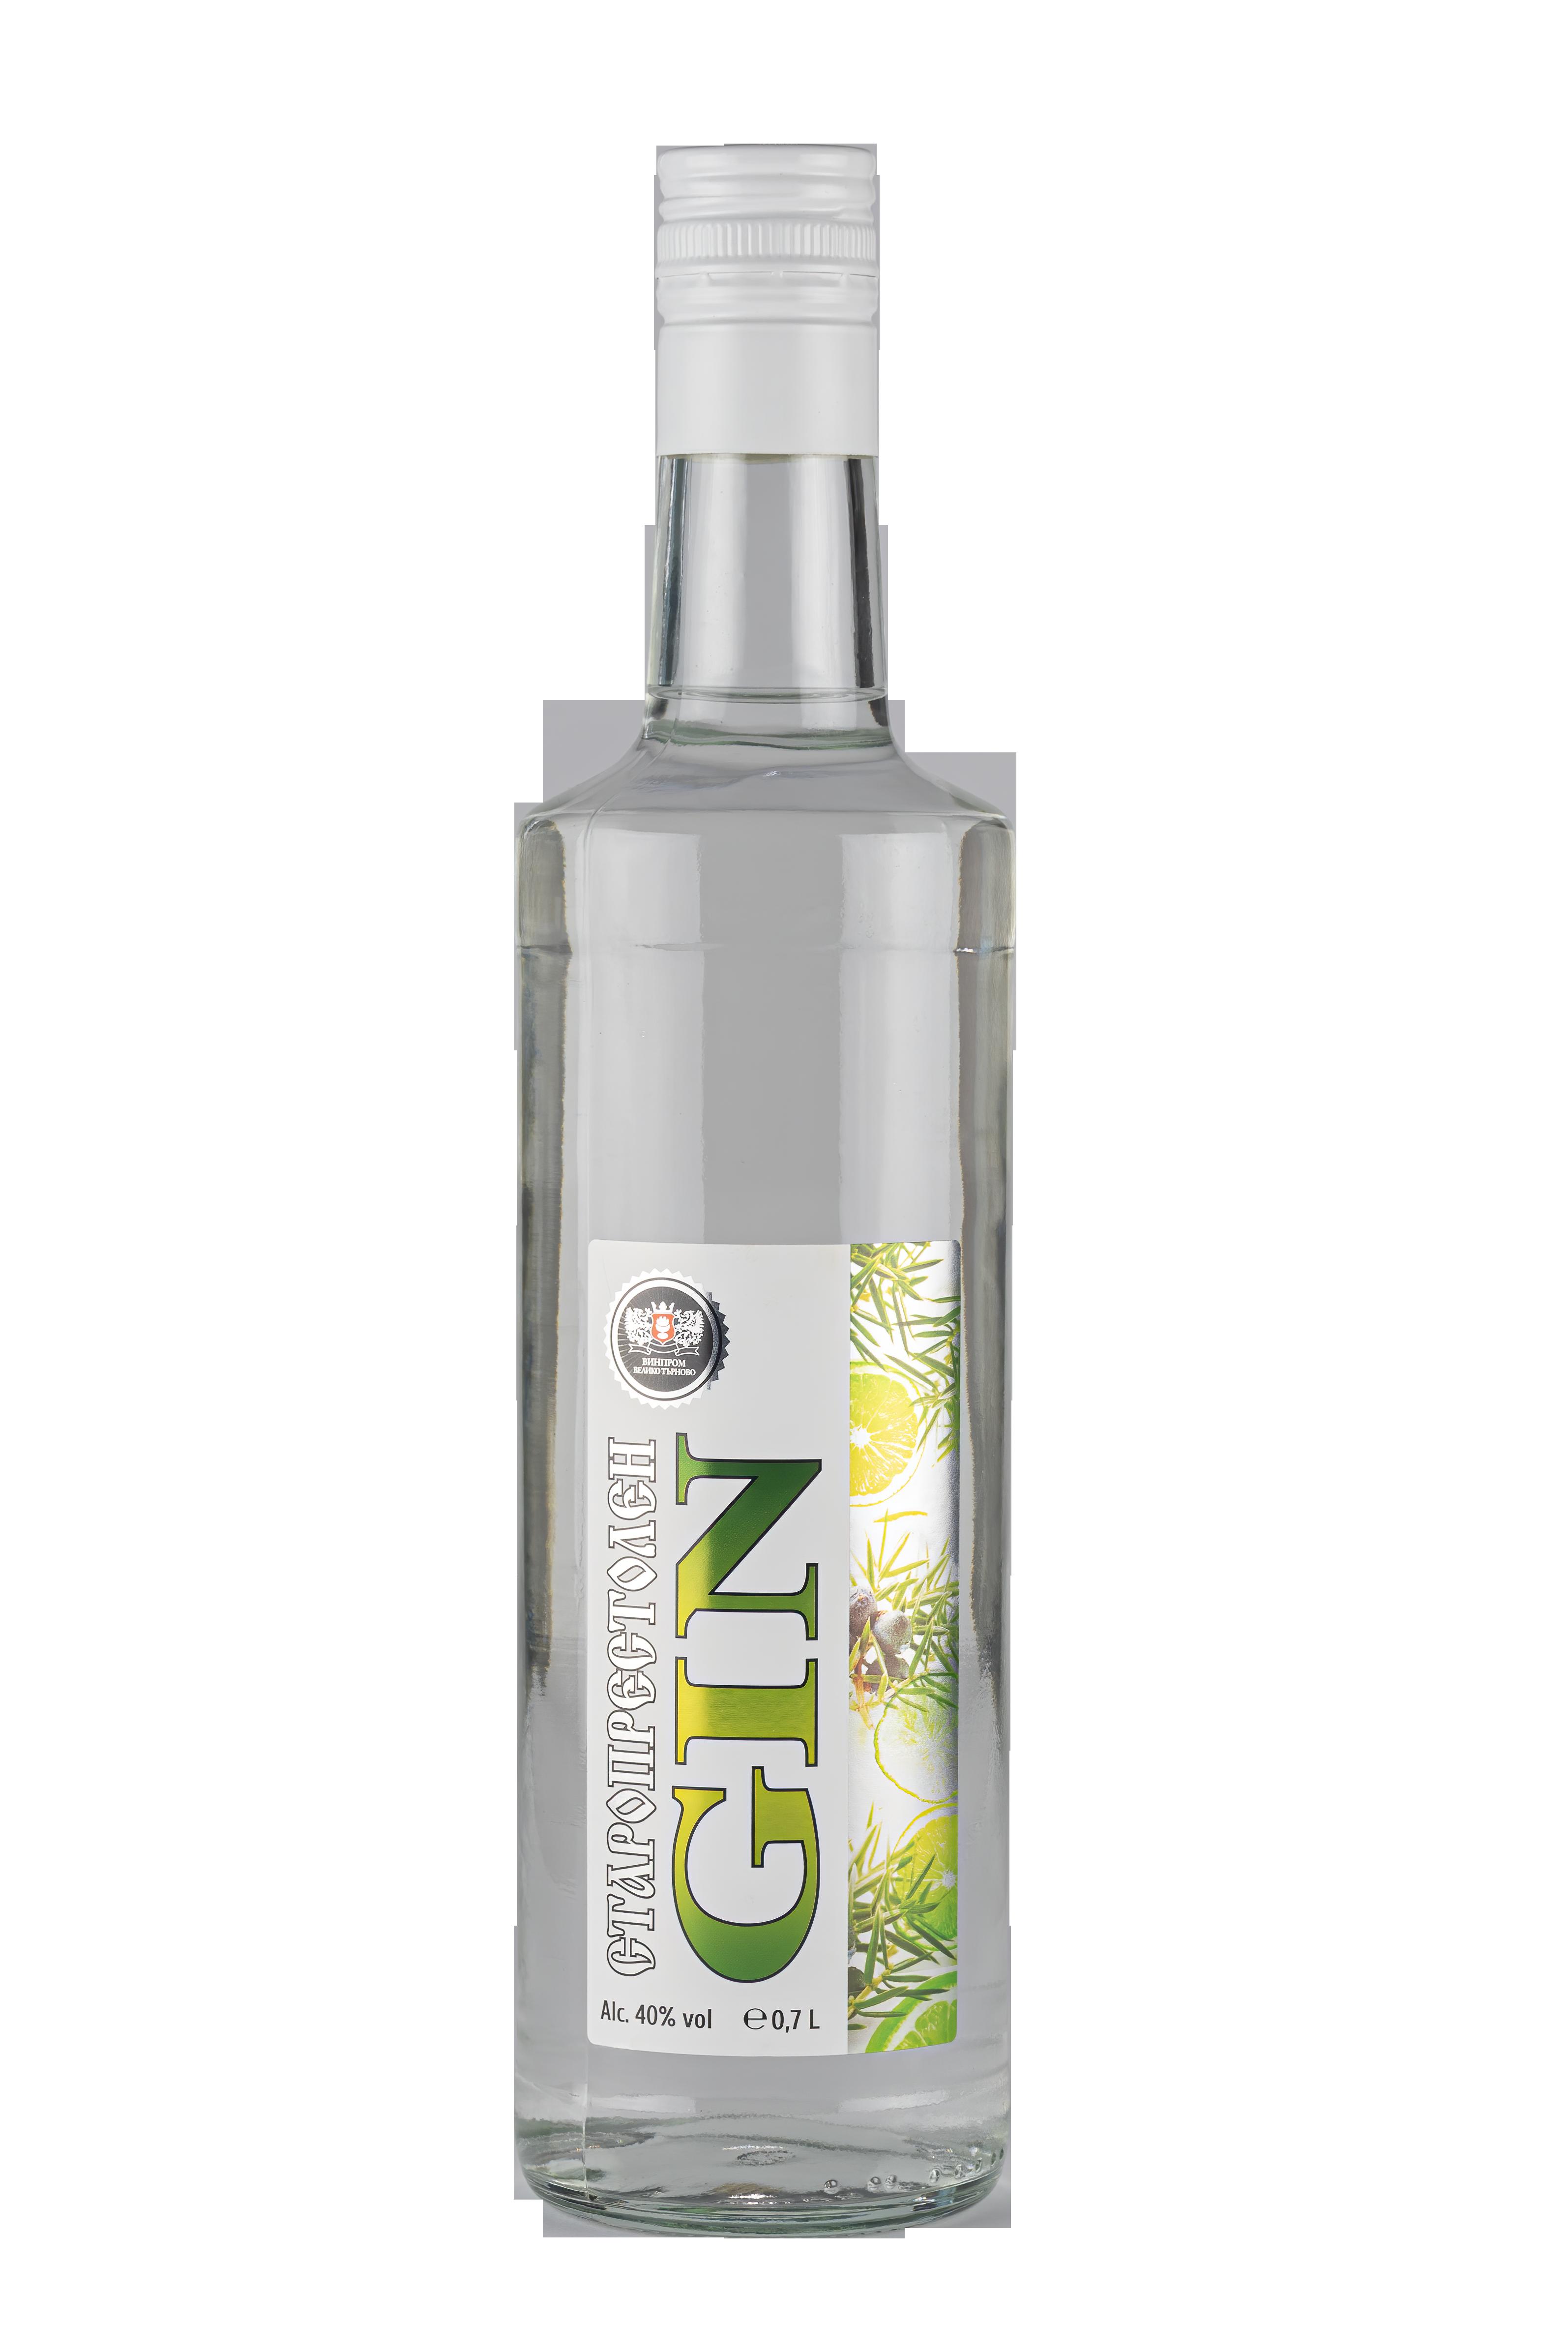 джин, джин старопрестолен, български джин, джин от винпром ад велико търново